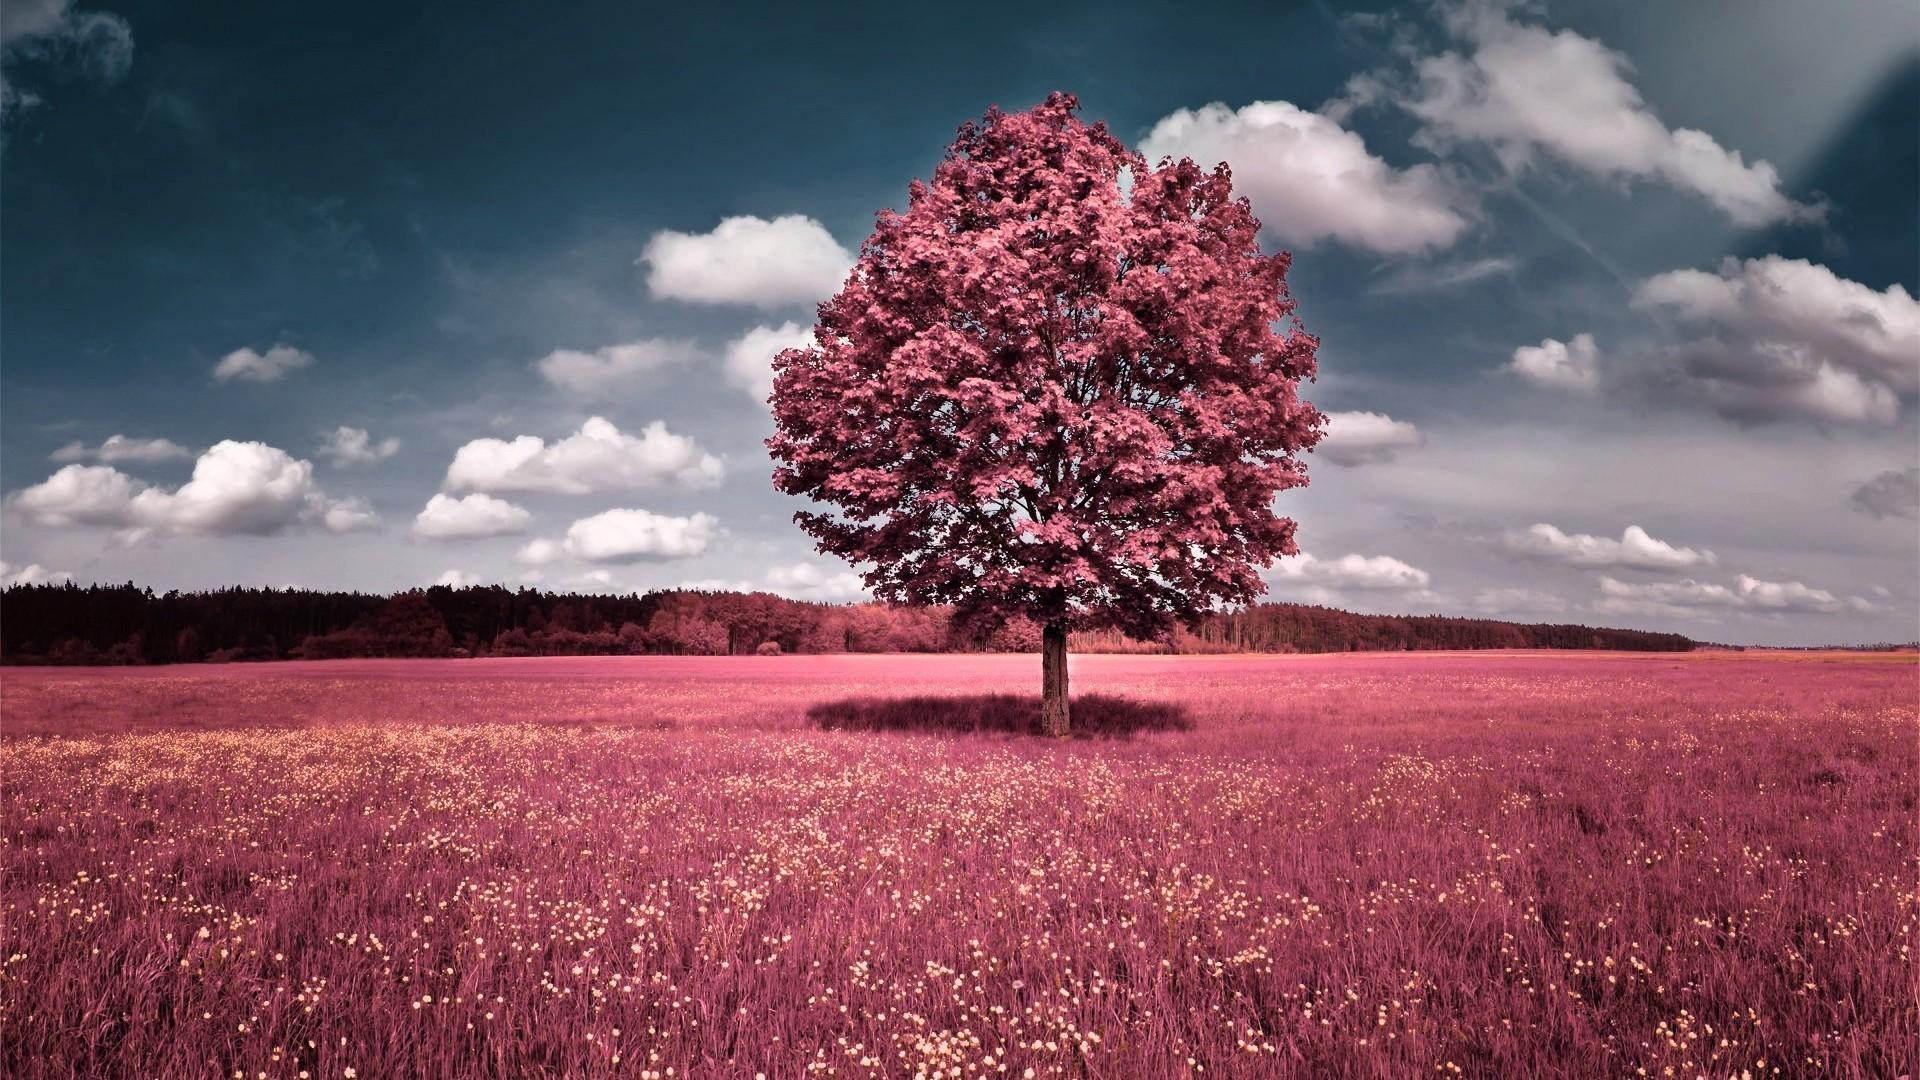 Wallpaper : sunlight, trees, landscape, sunset, nature, sky, field ...